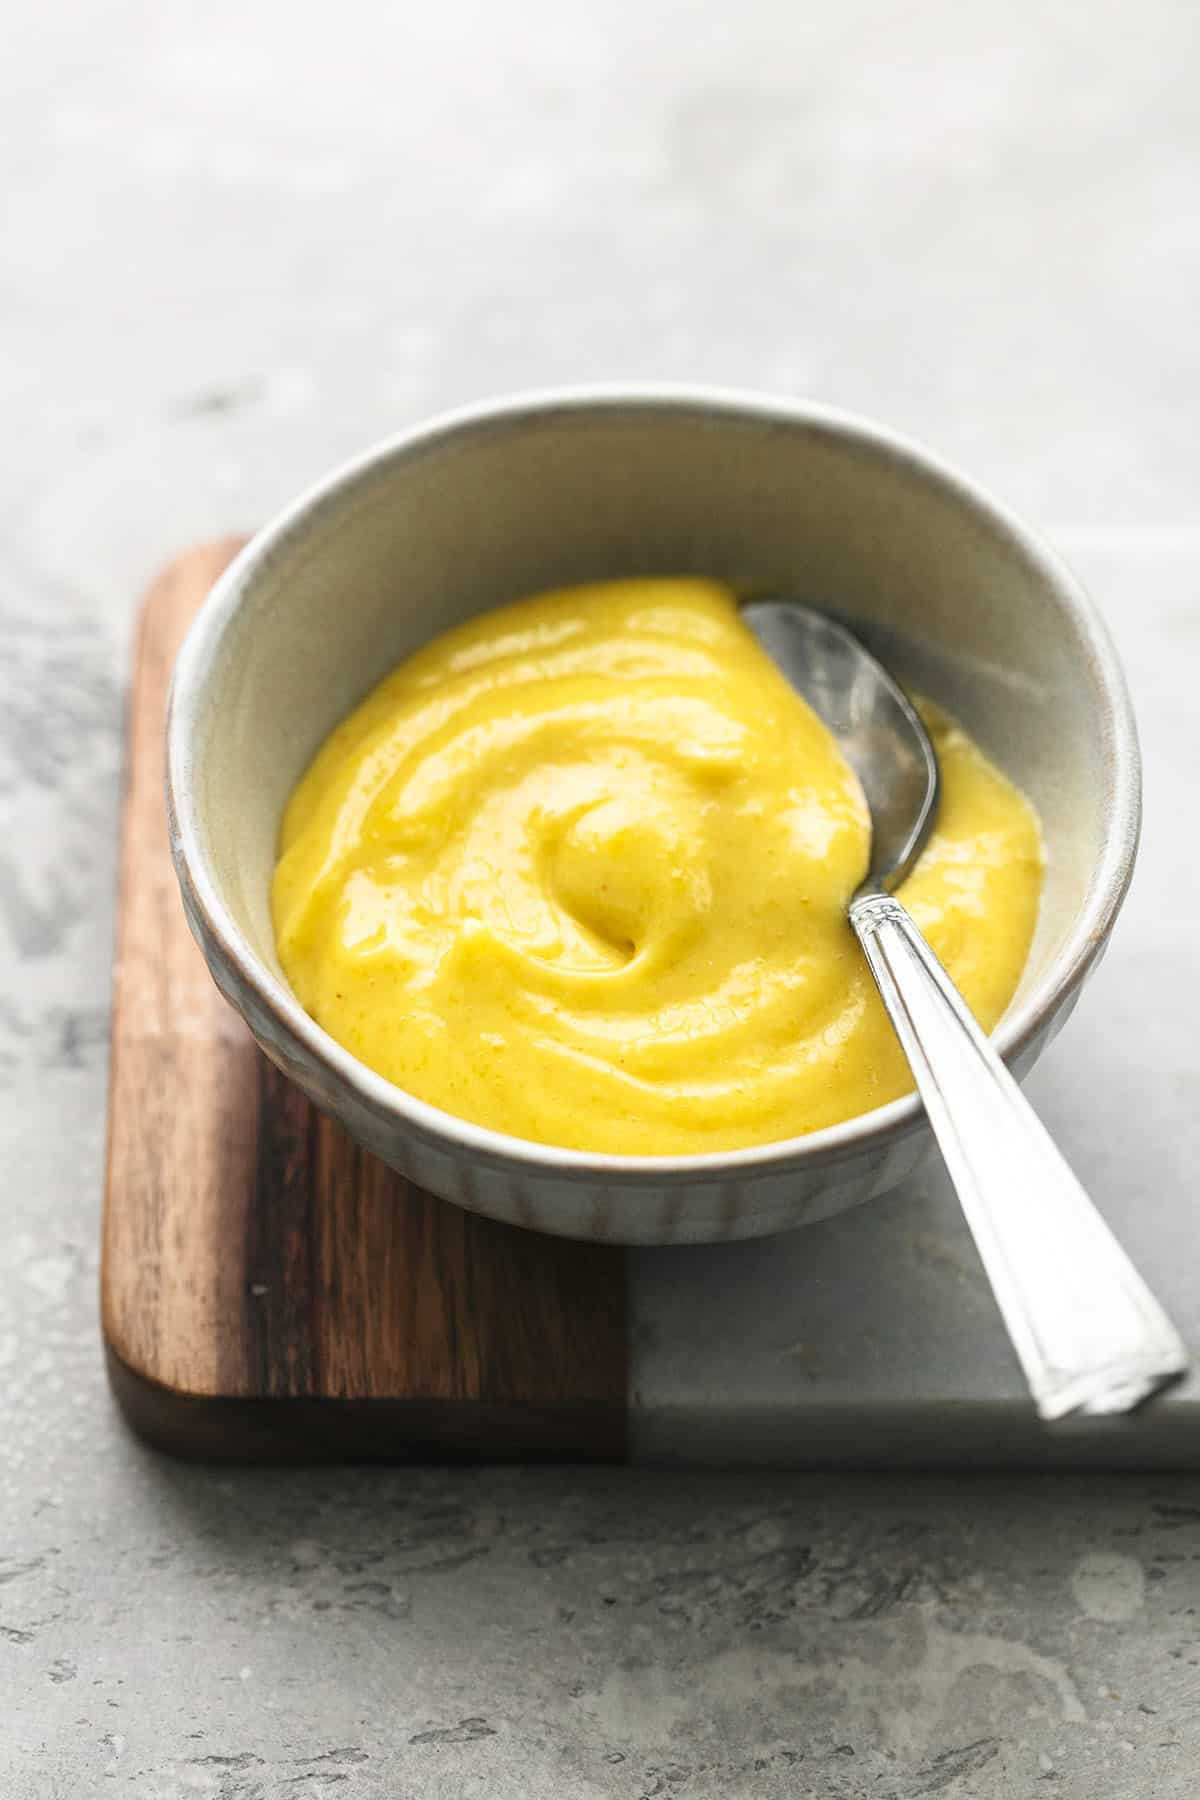 garlic aioli in small bowl with spoon on top of cutting board